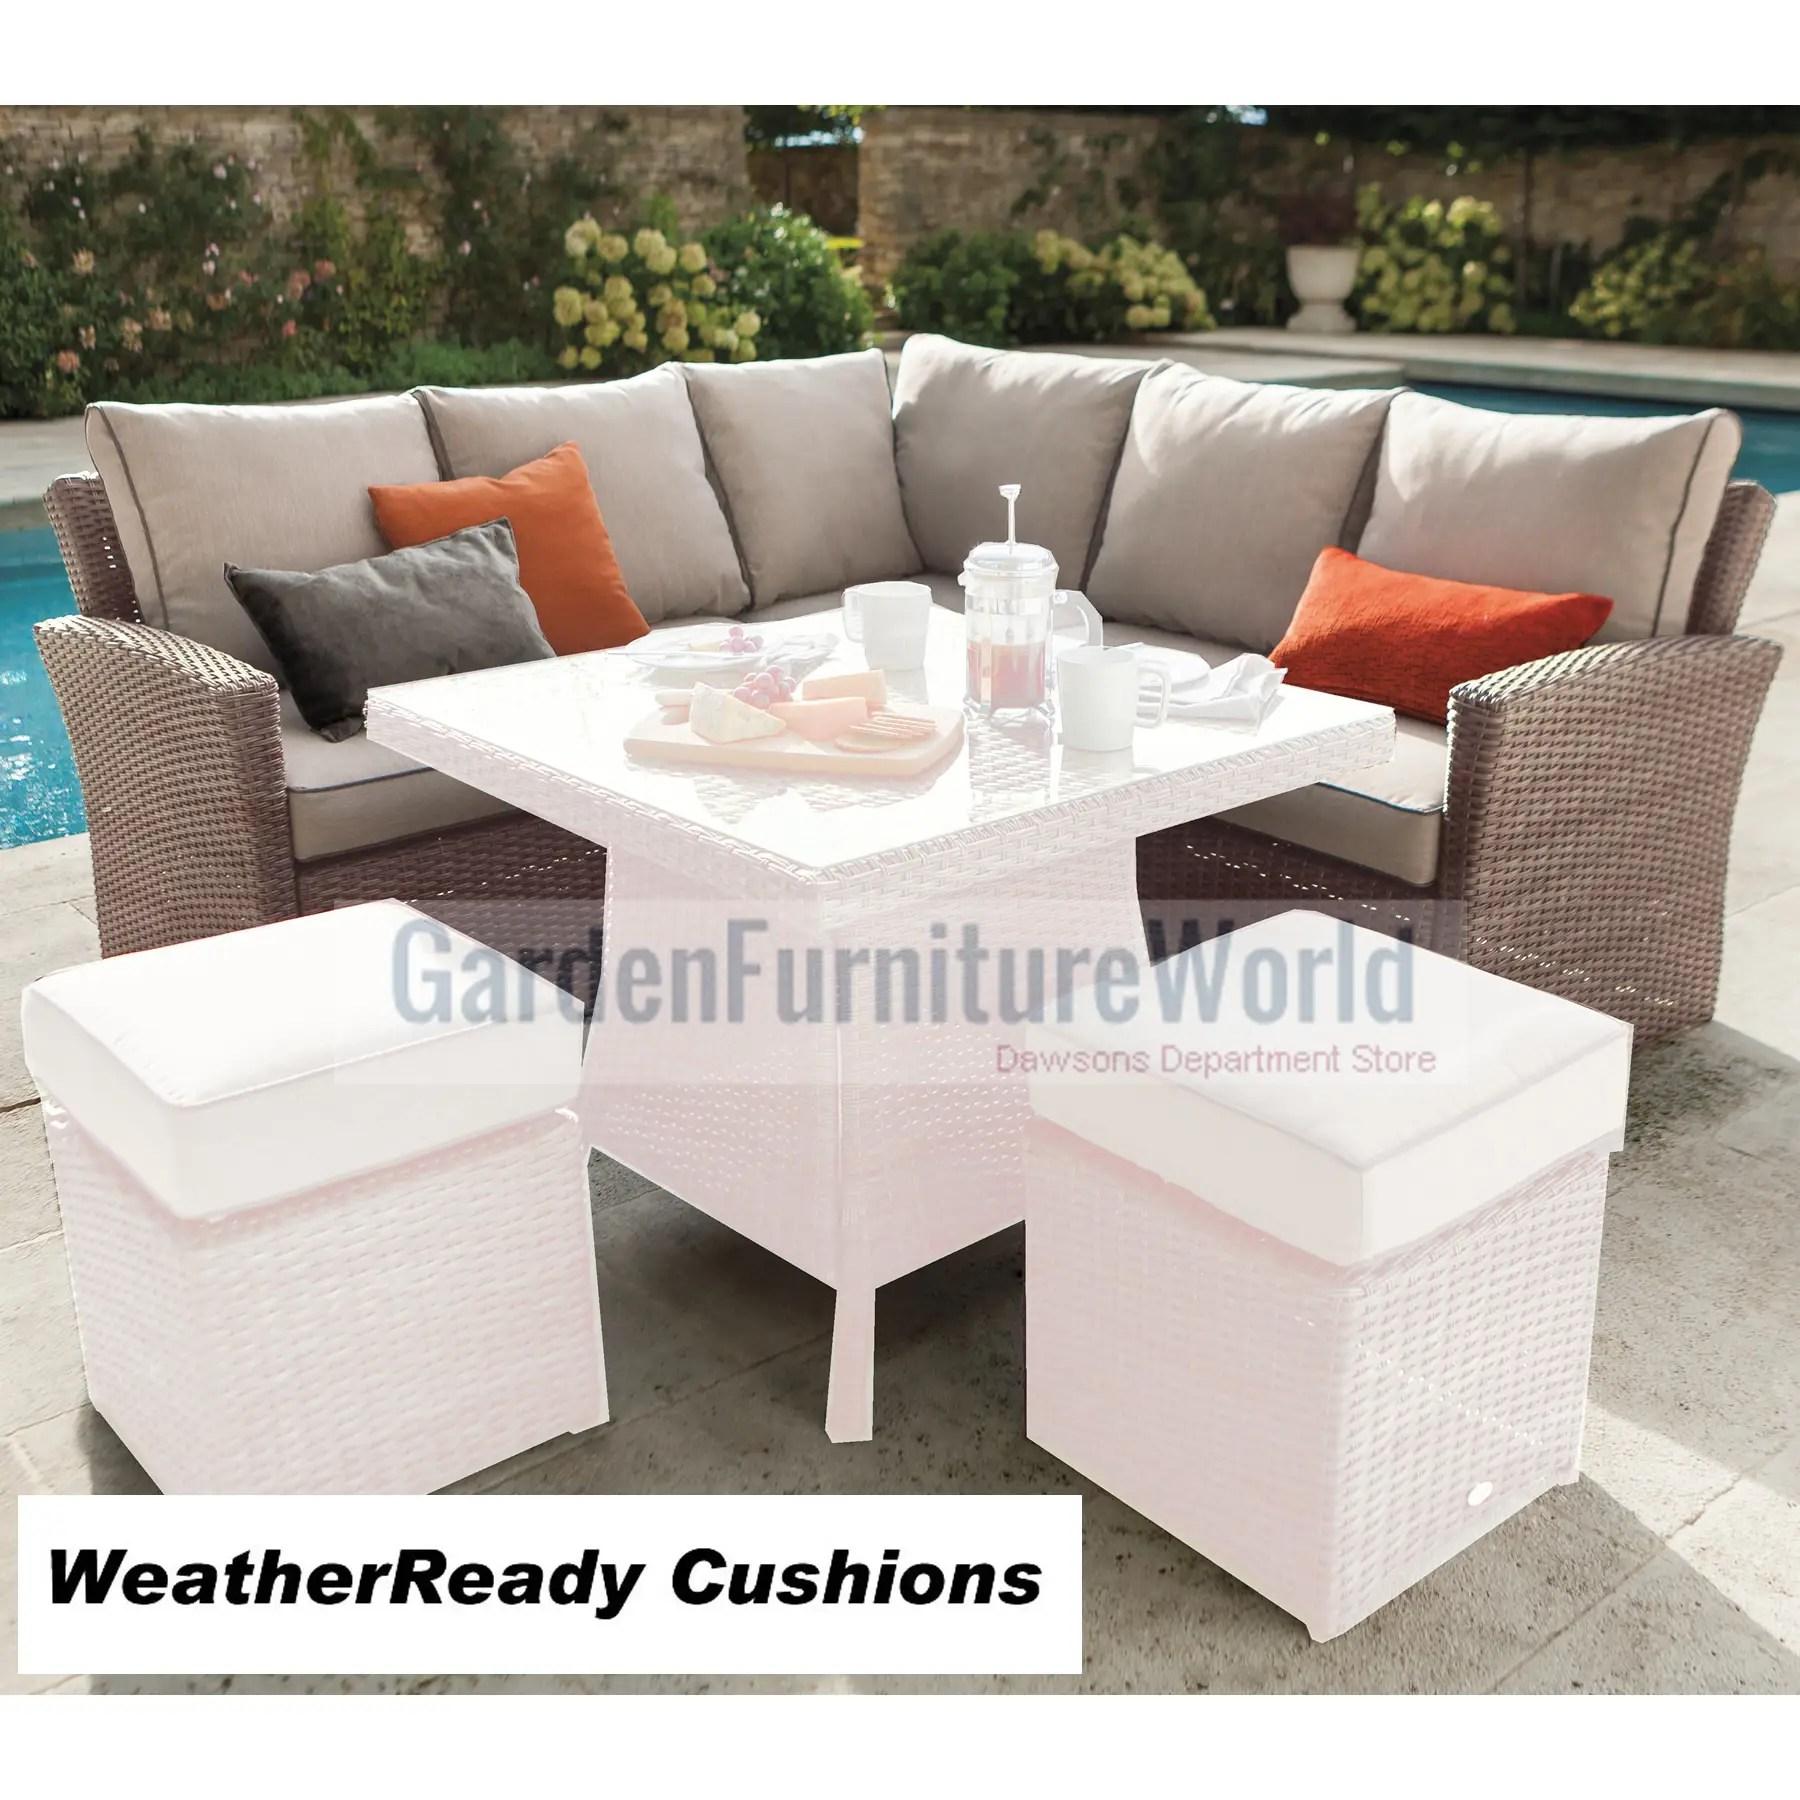 large square sofa cushions marshmallow flip open disney toy story gardenfurnitureworld mobile